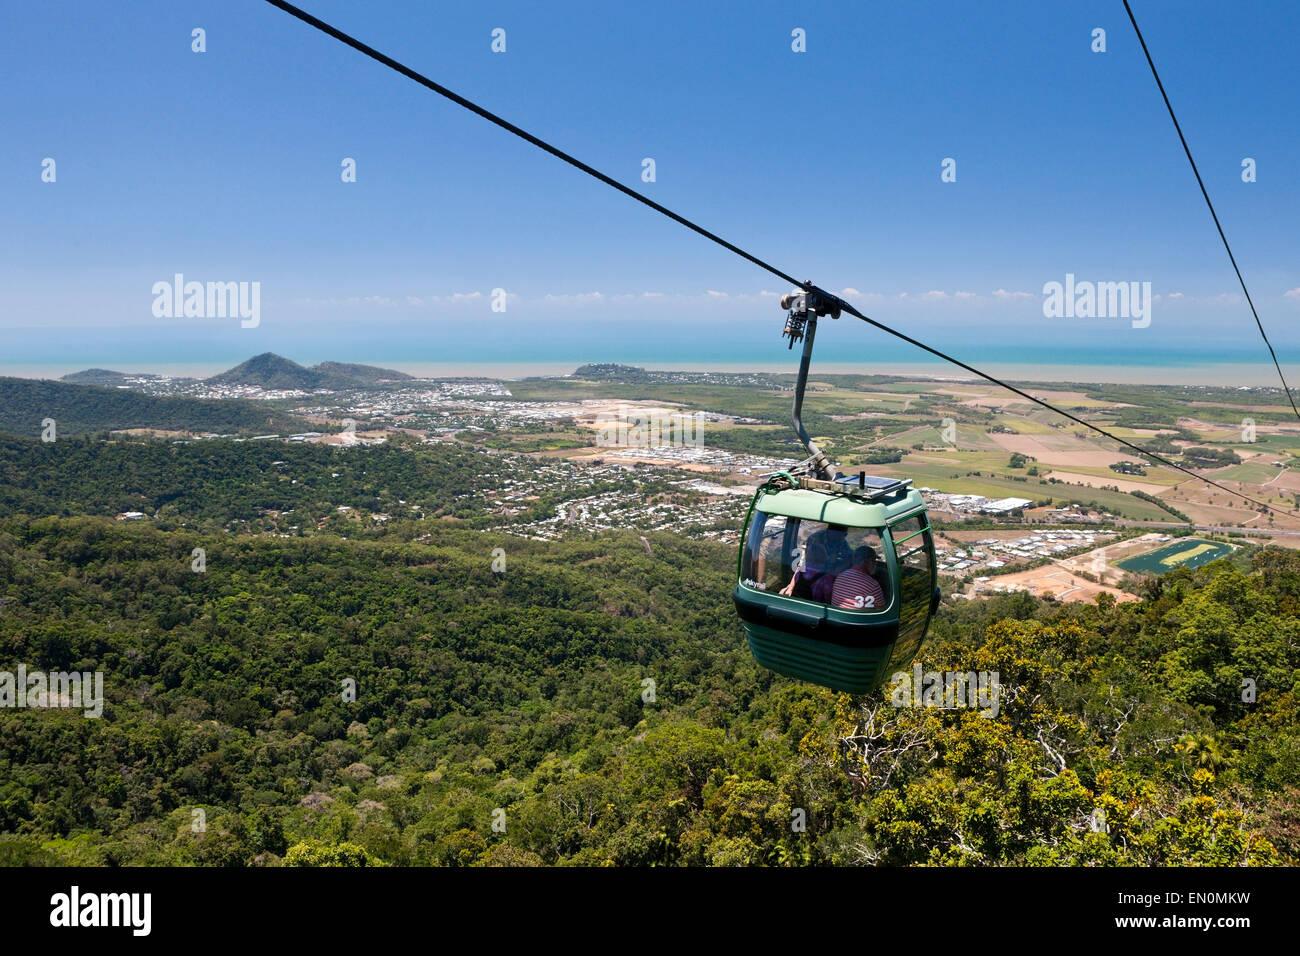 With the Skyrail Rainforest Cableway to Kuranda, Cairns, Australia - Stock Image